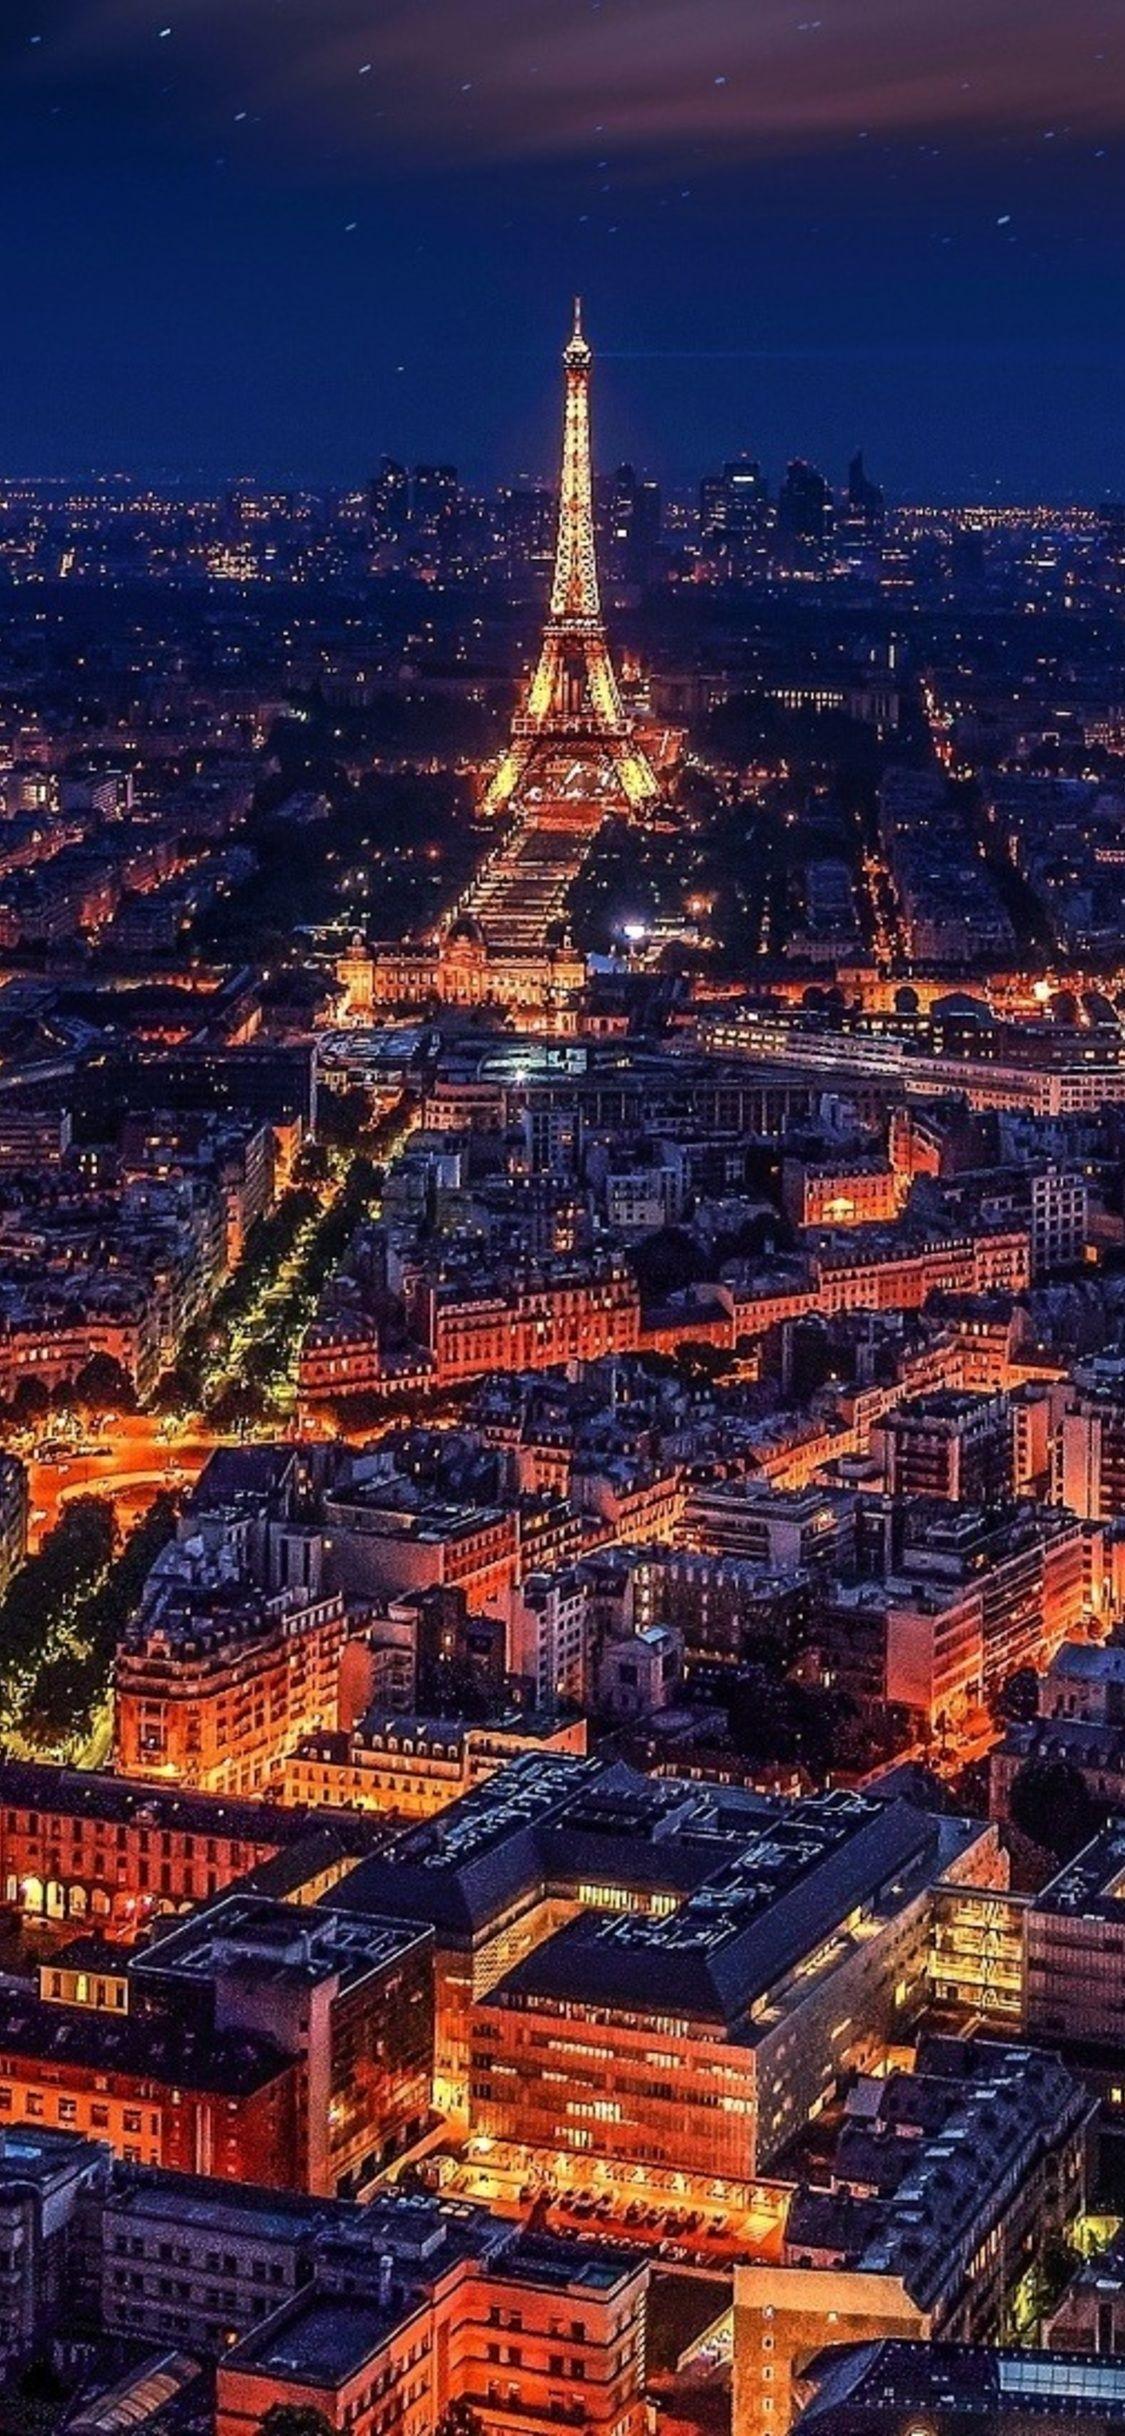 Iphone Xr Wallpaper 4k Download Mywallpapers Site Paris Travel Travel Paris Travel Tips